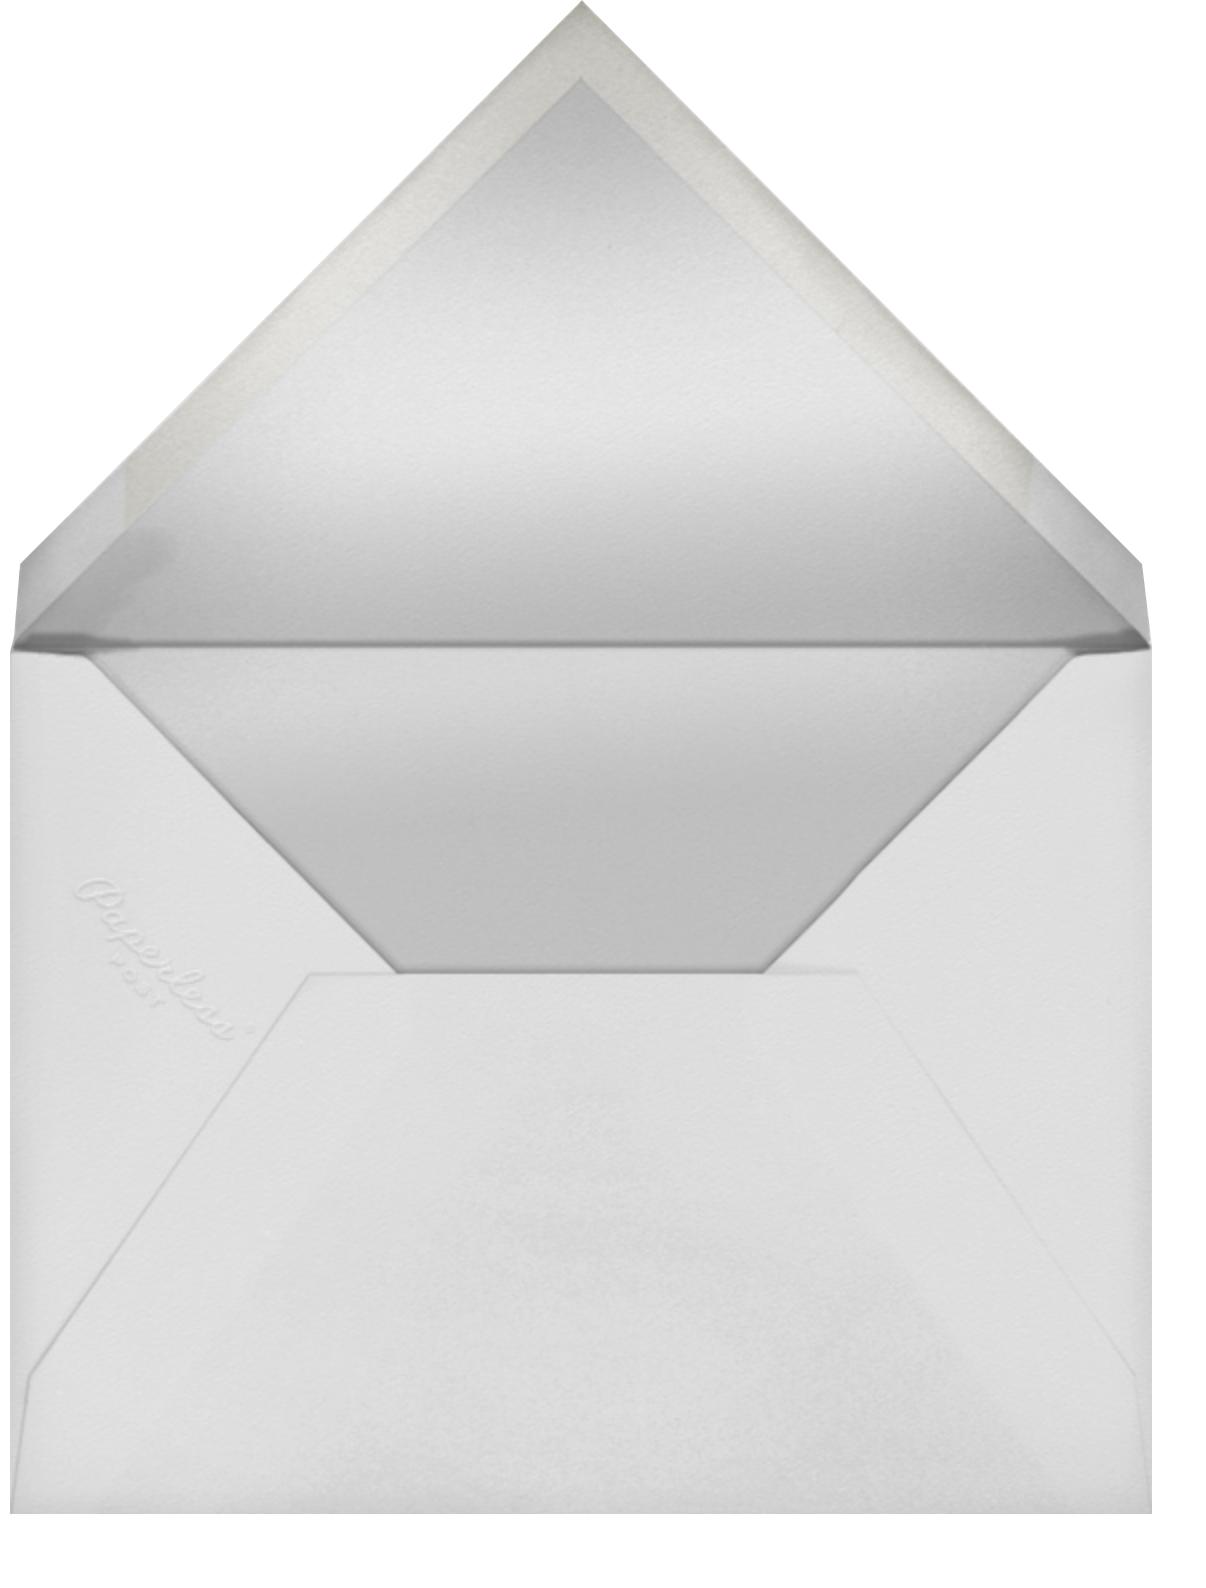 Leiden (Menu) - Black - Paperless Post - Menus - envelope back